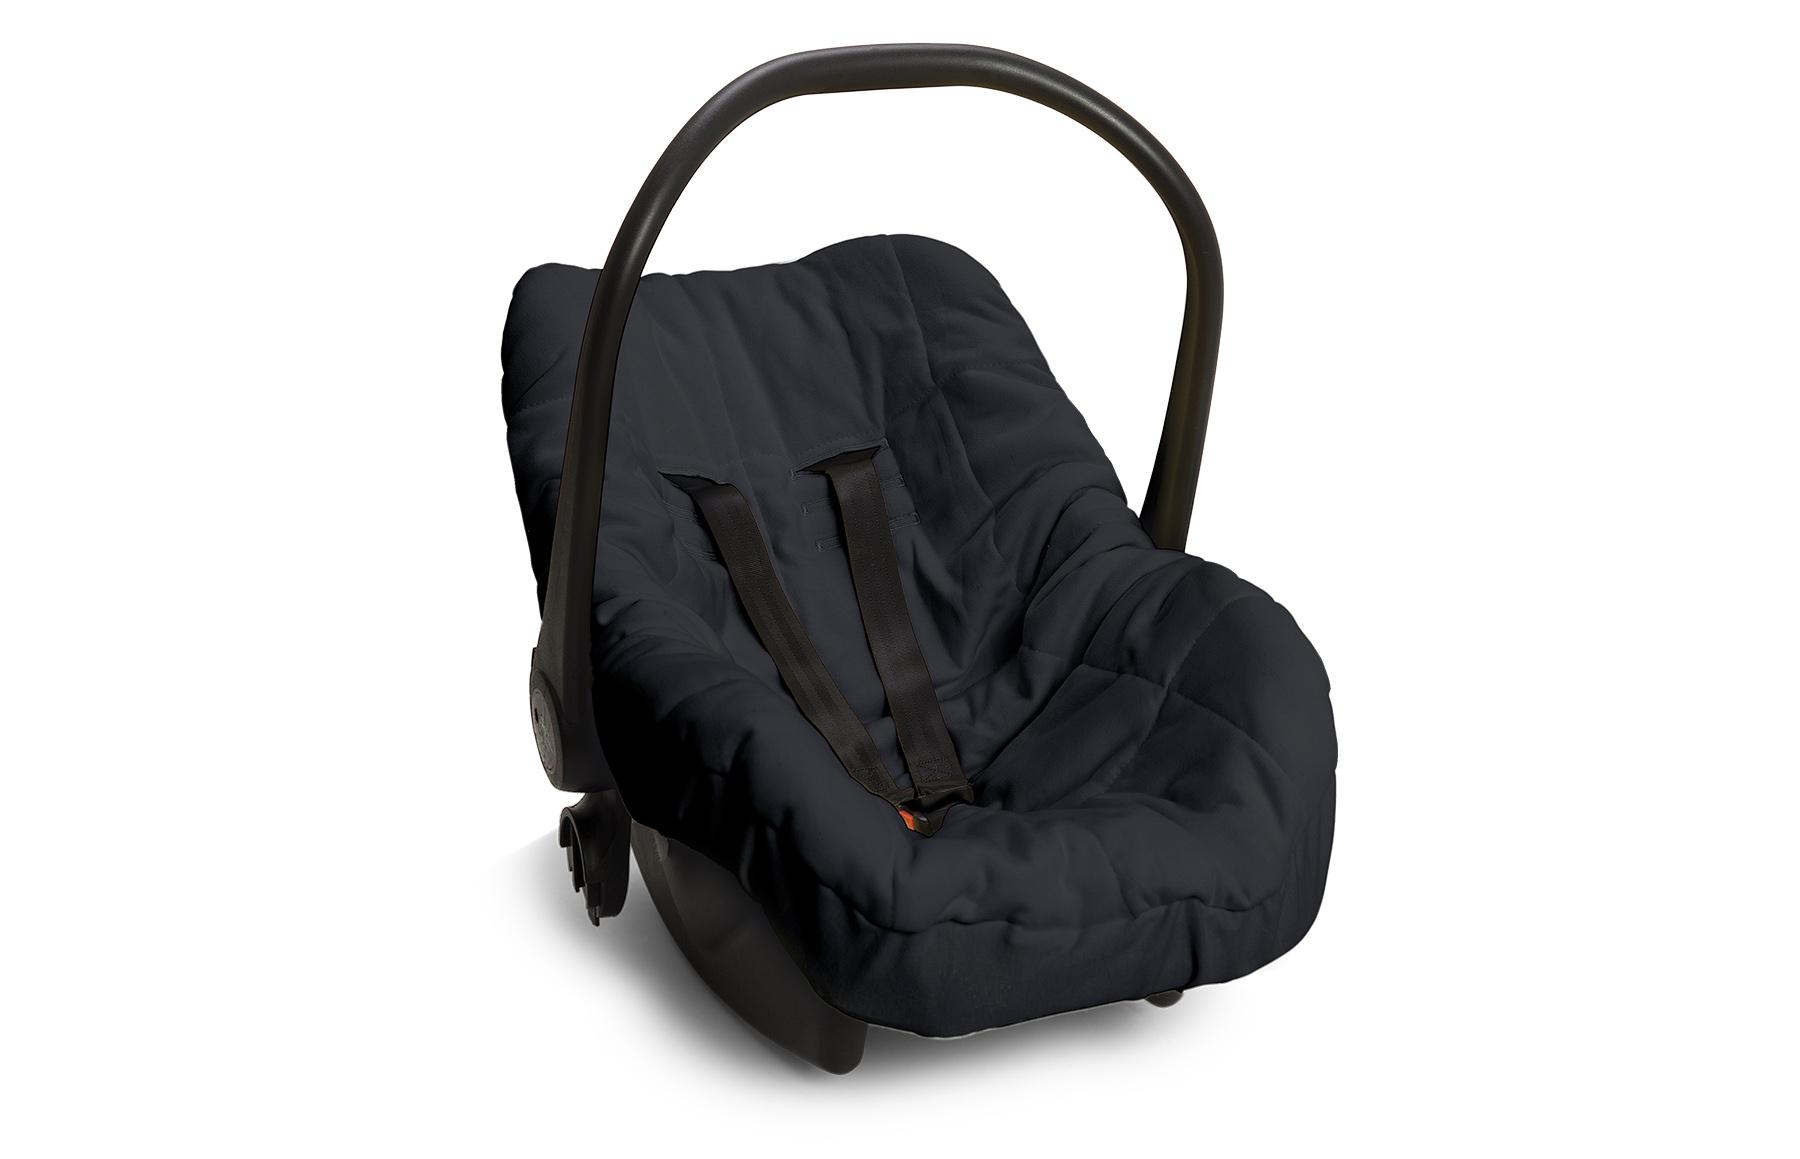 Capa Bebe Conforto Acessorios - Preto